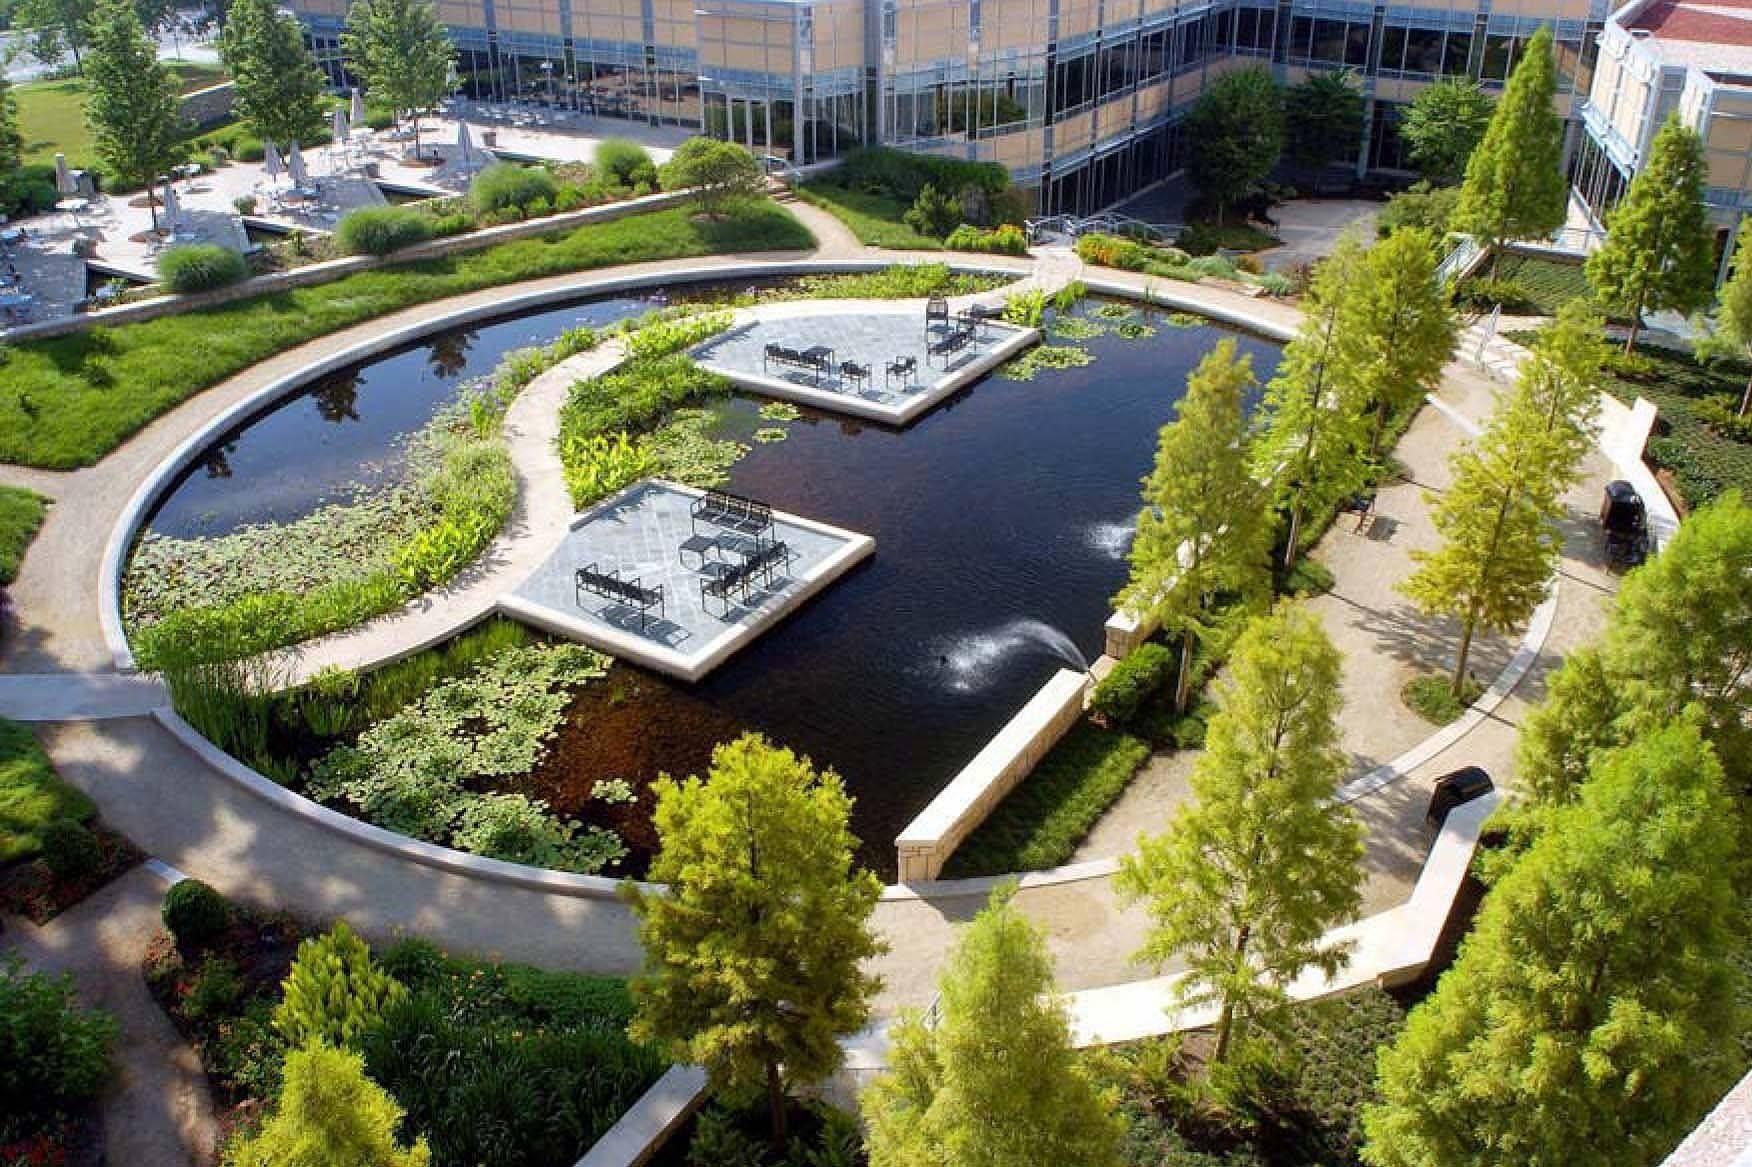 Landscape architect atlanta ga - Award Winning Office Campus Design At The Cox Enterprises Gardens In Atlanta Georgia By Hgor Landscape Architects Network